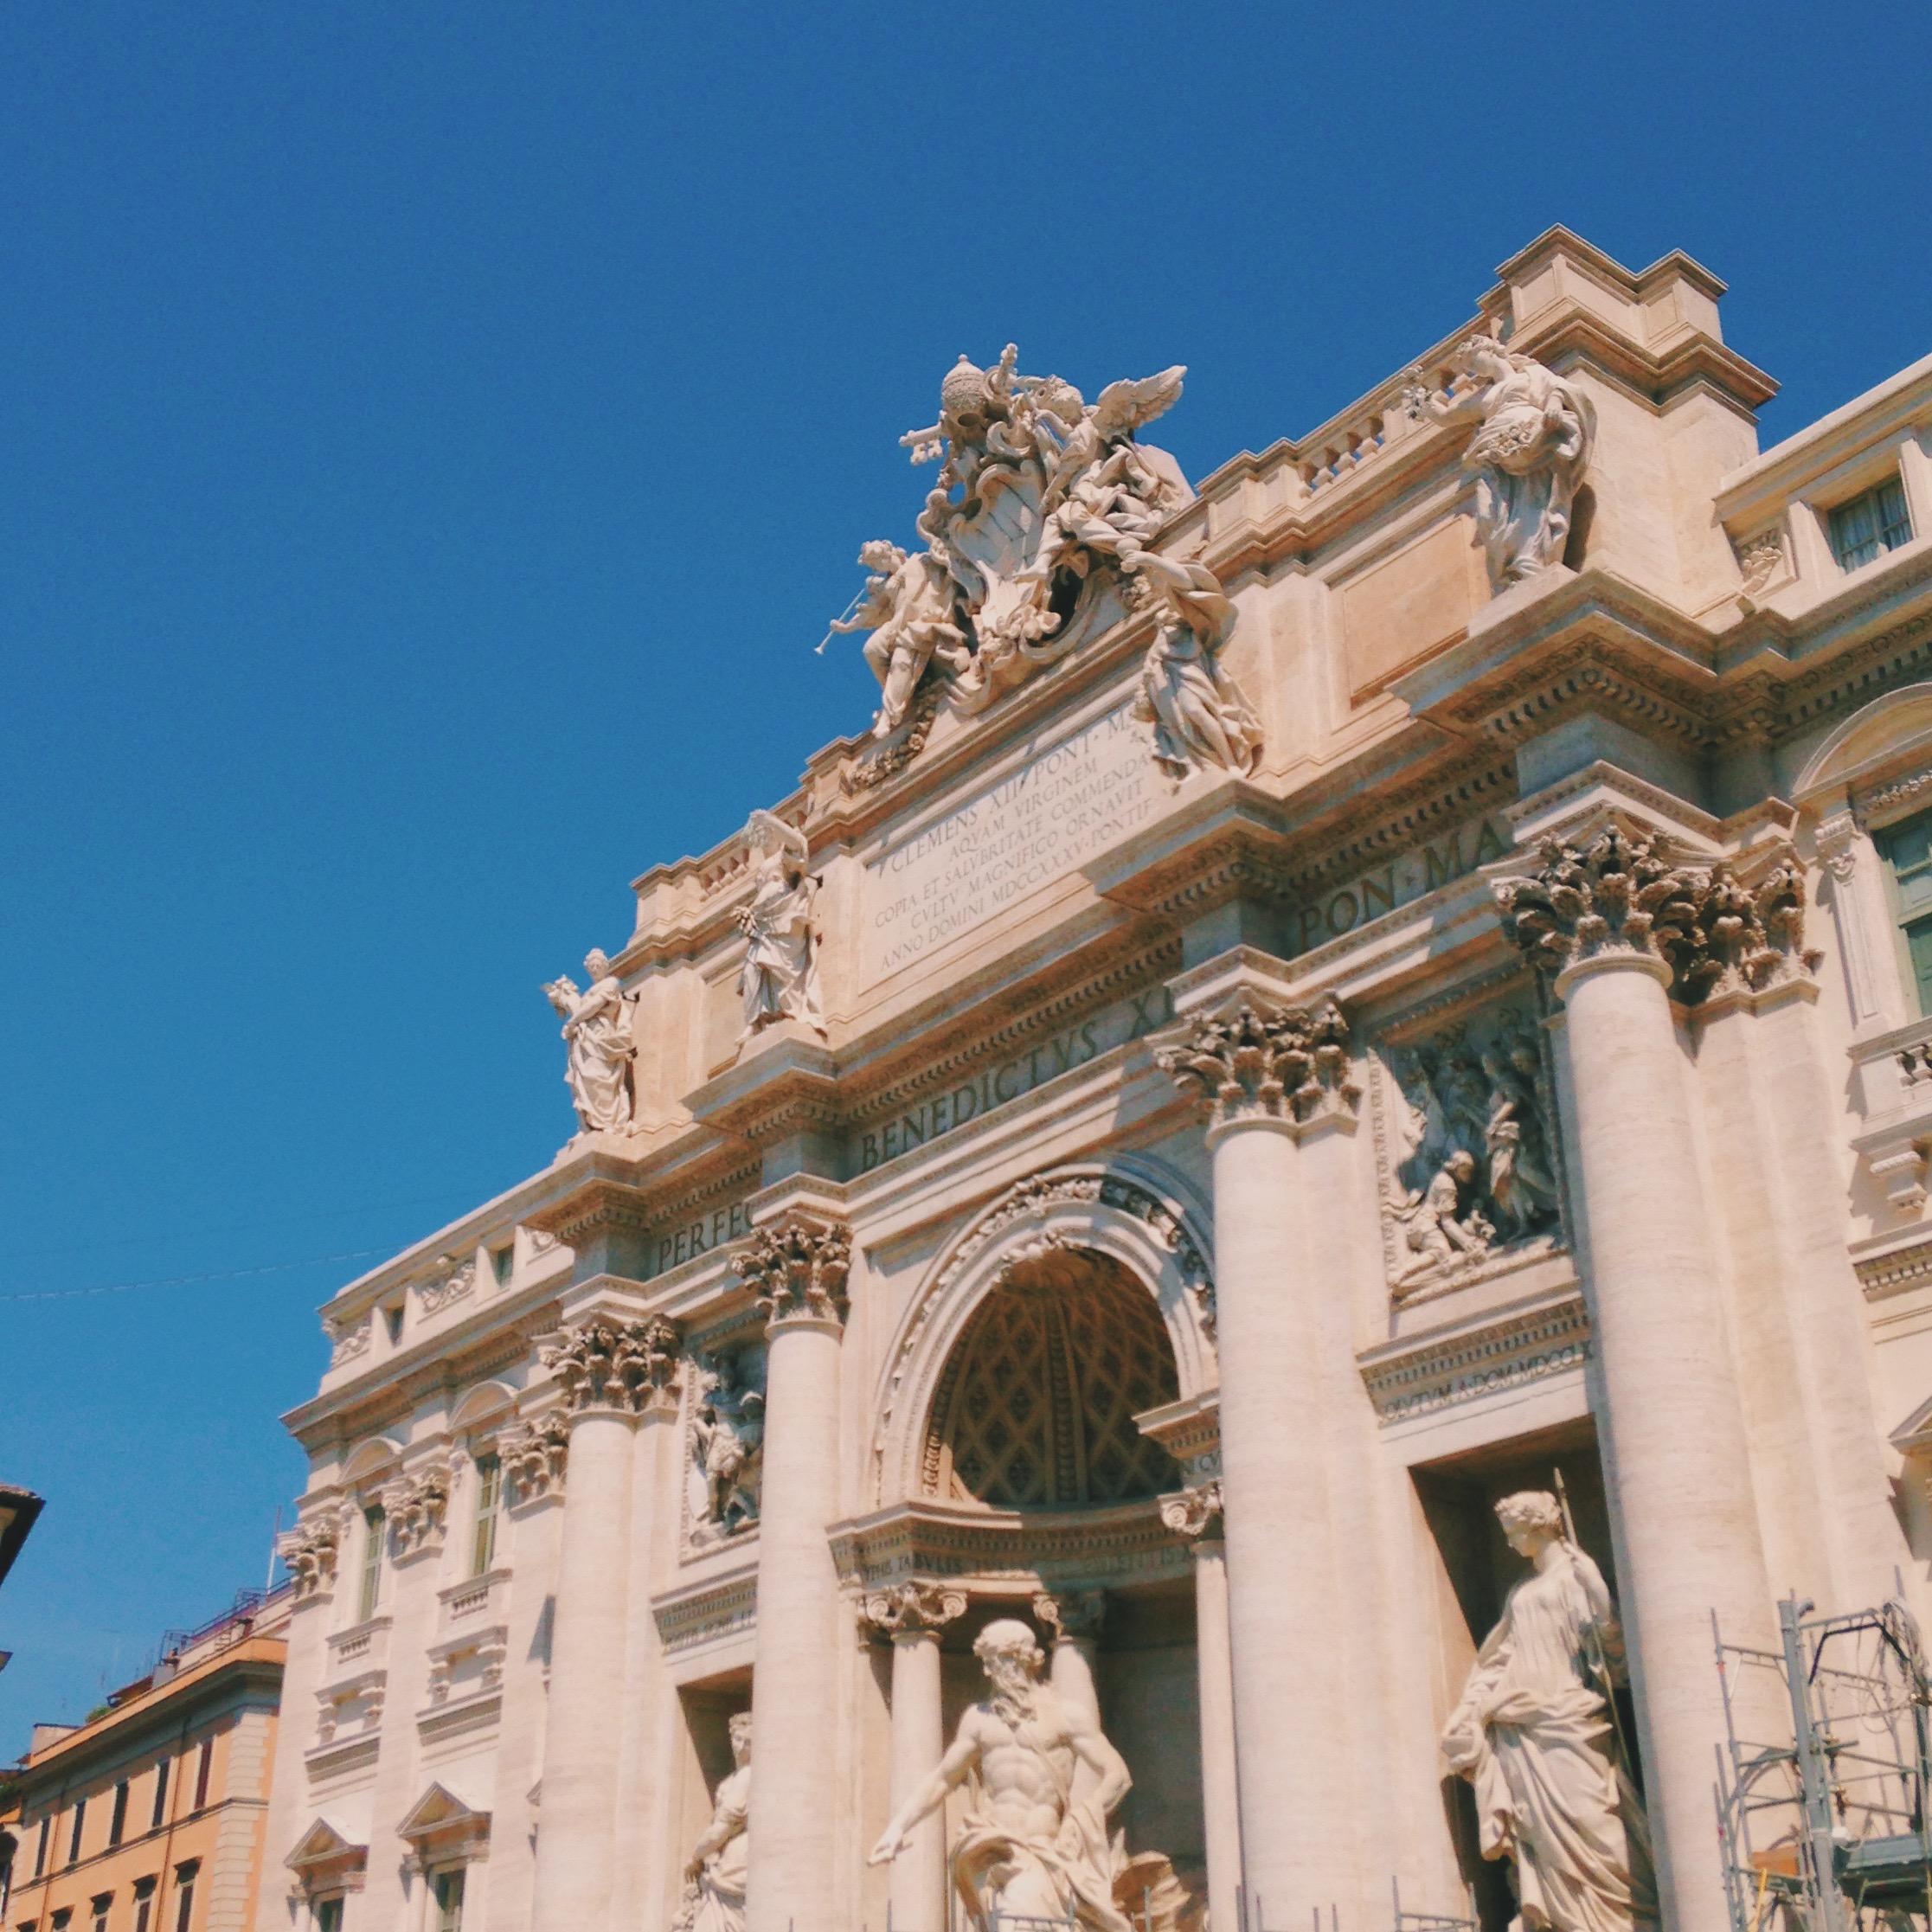 Renovated Trevi Fountain